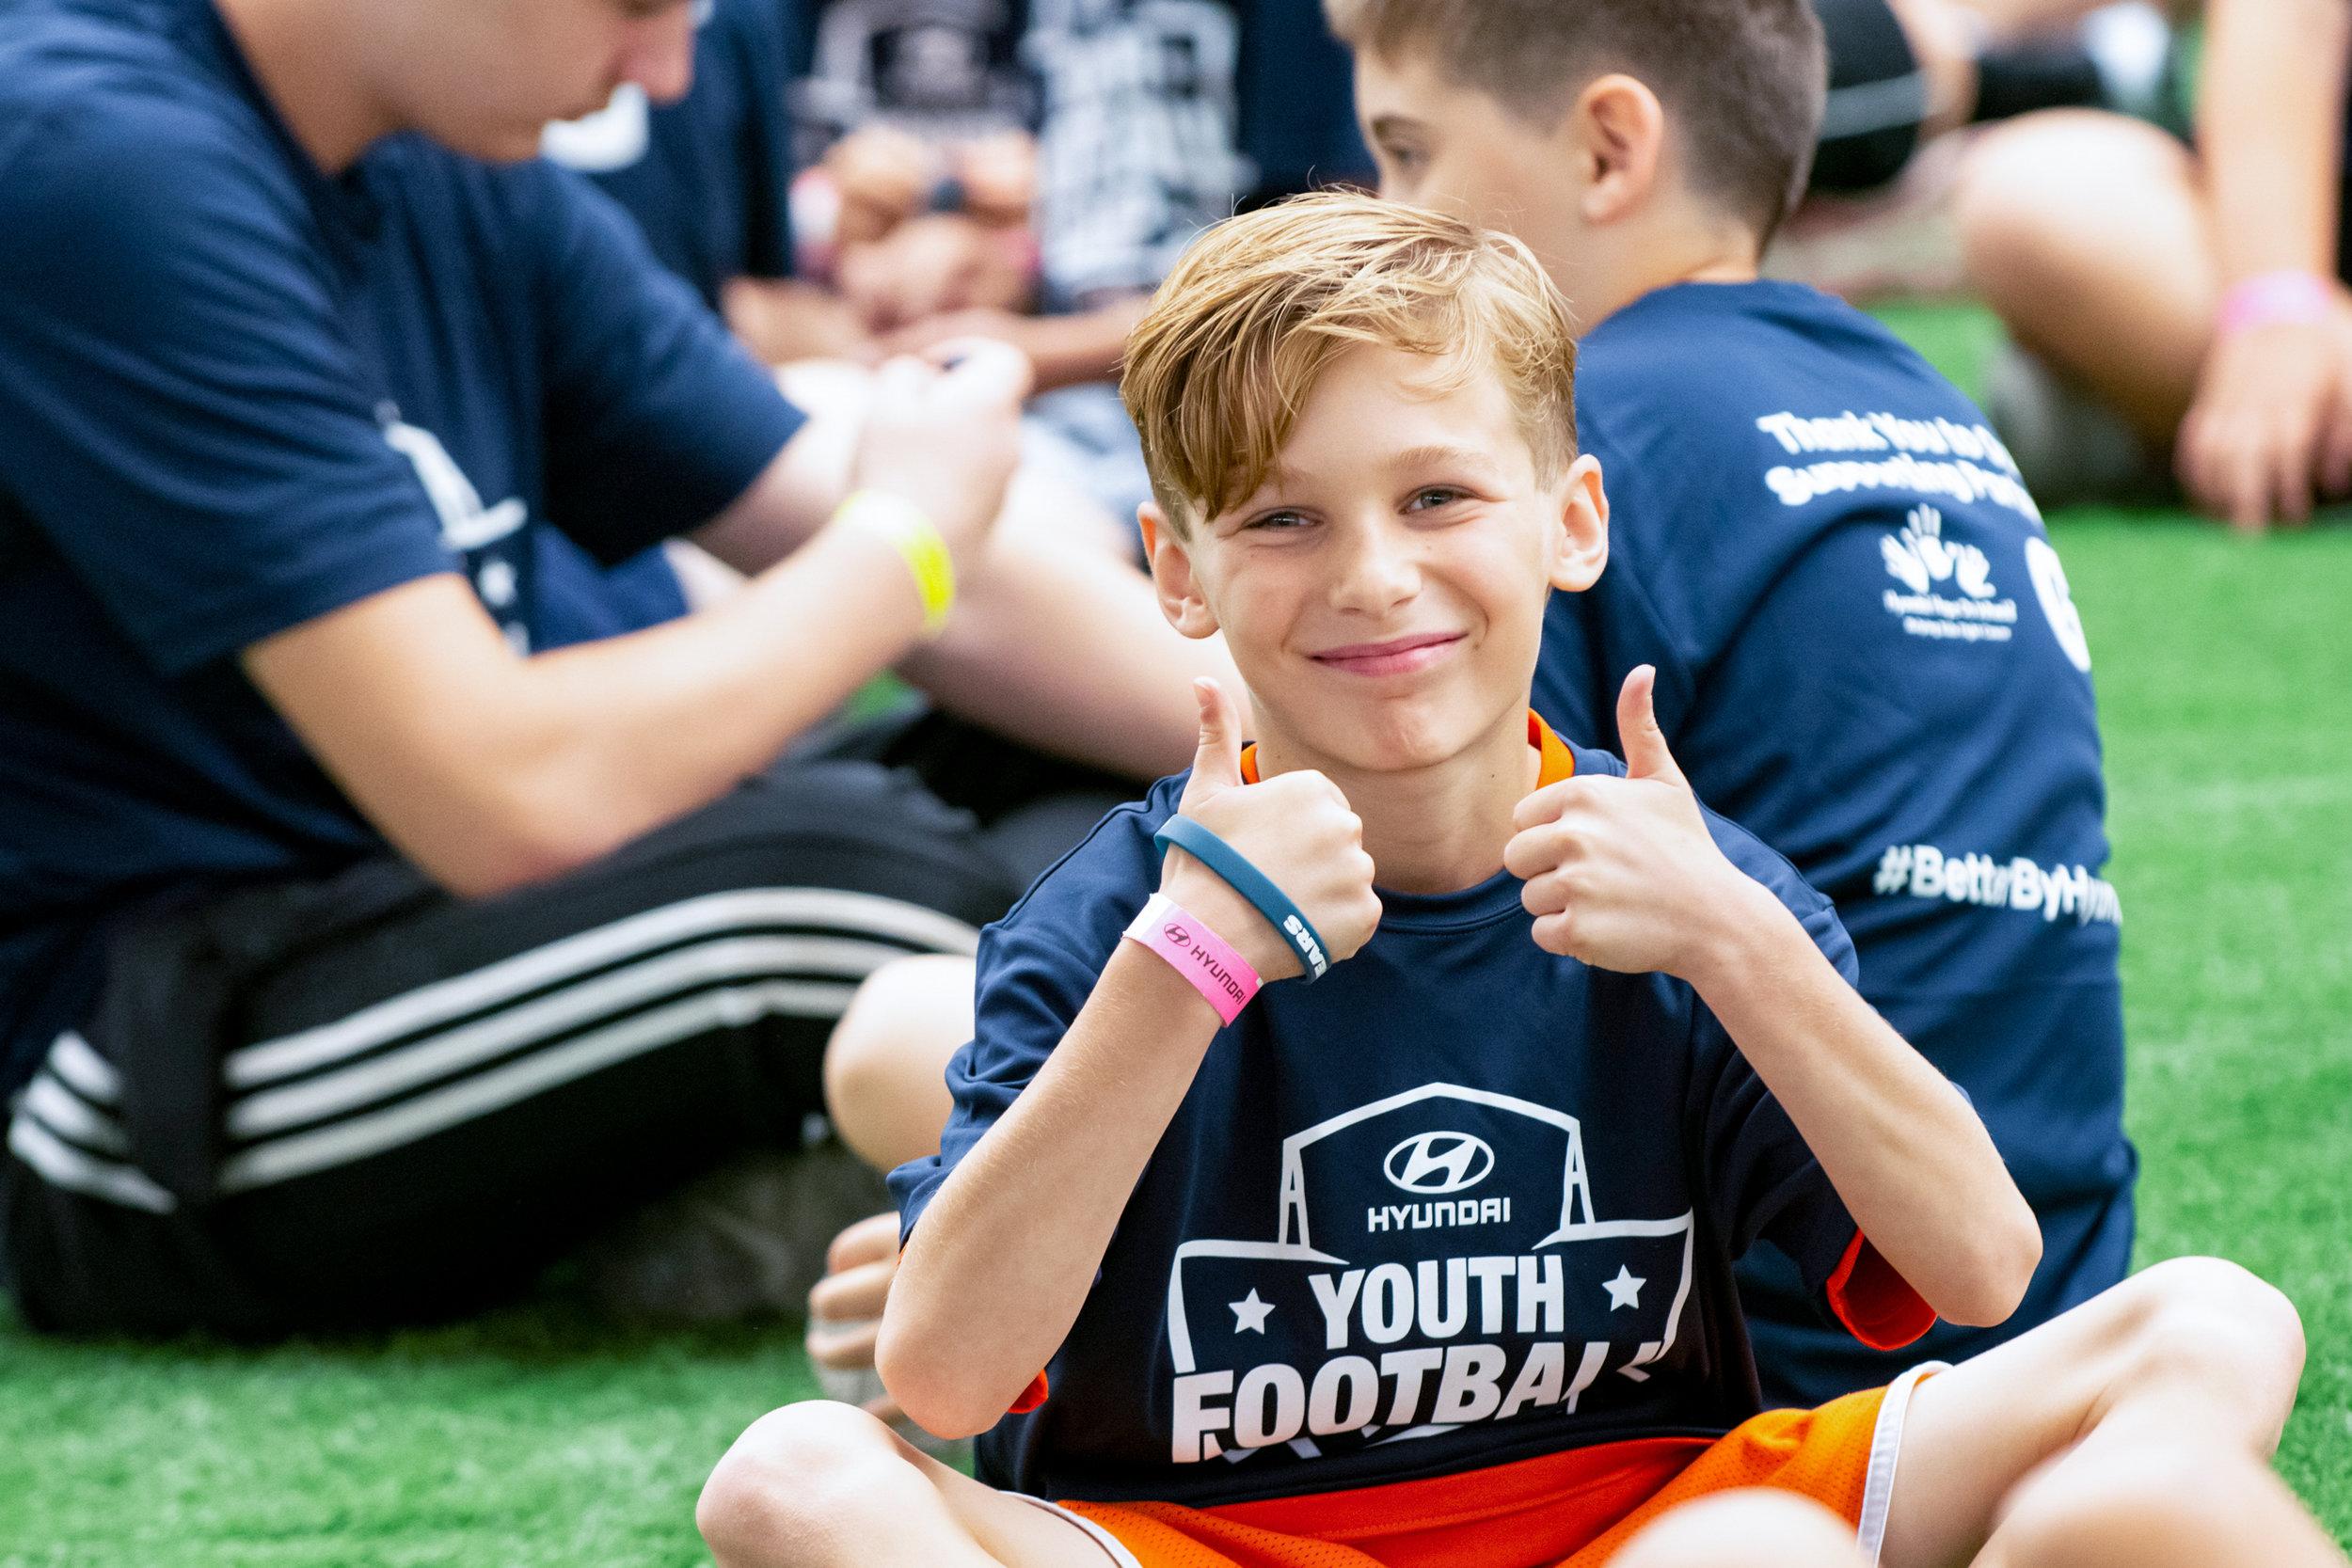 OHelloMedia-Hyundai-YouthFootballCamps-Chicago-TopSelect-3673.jpg